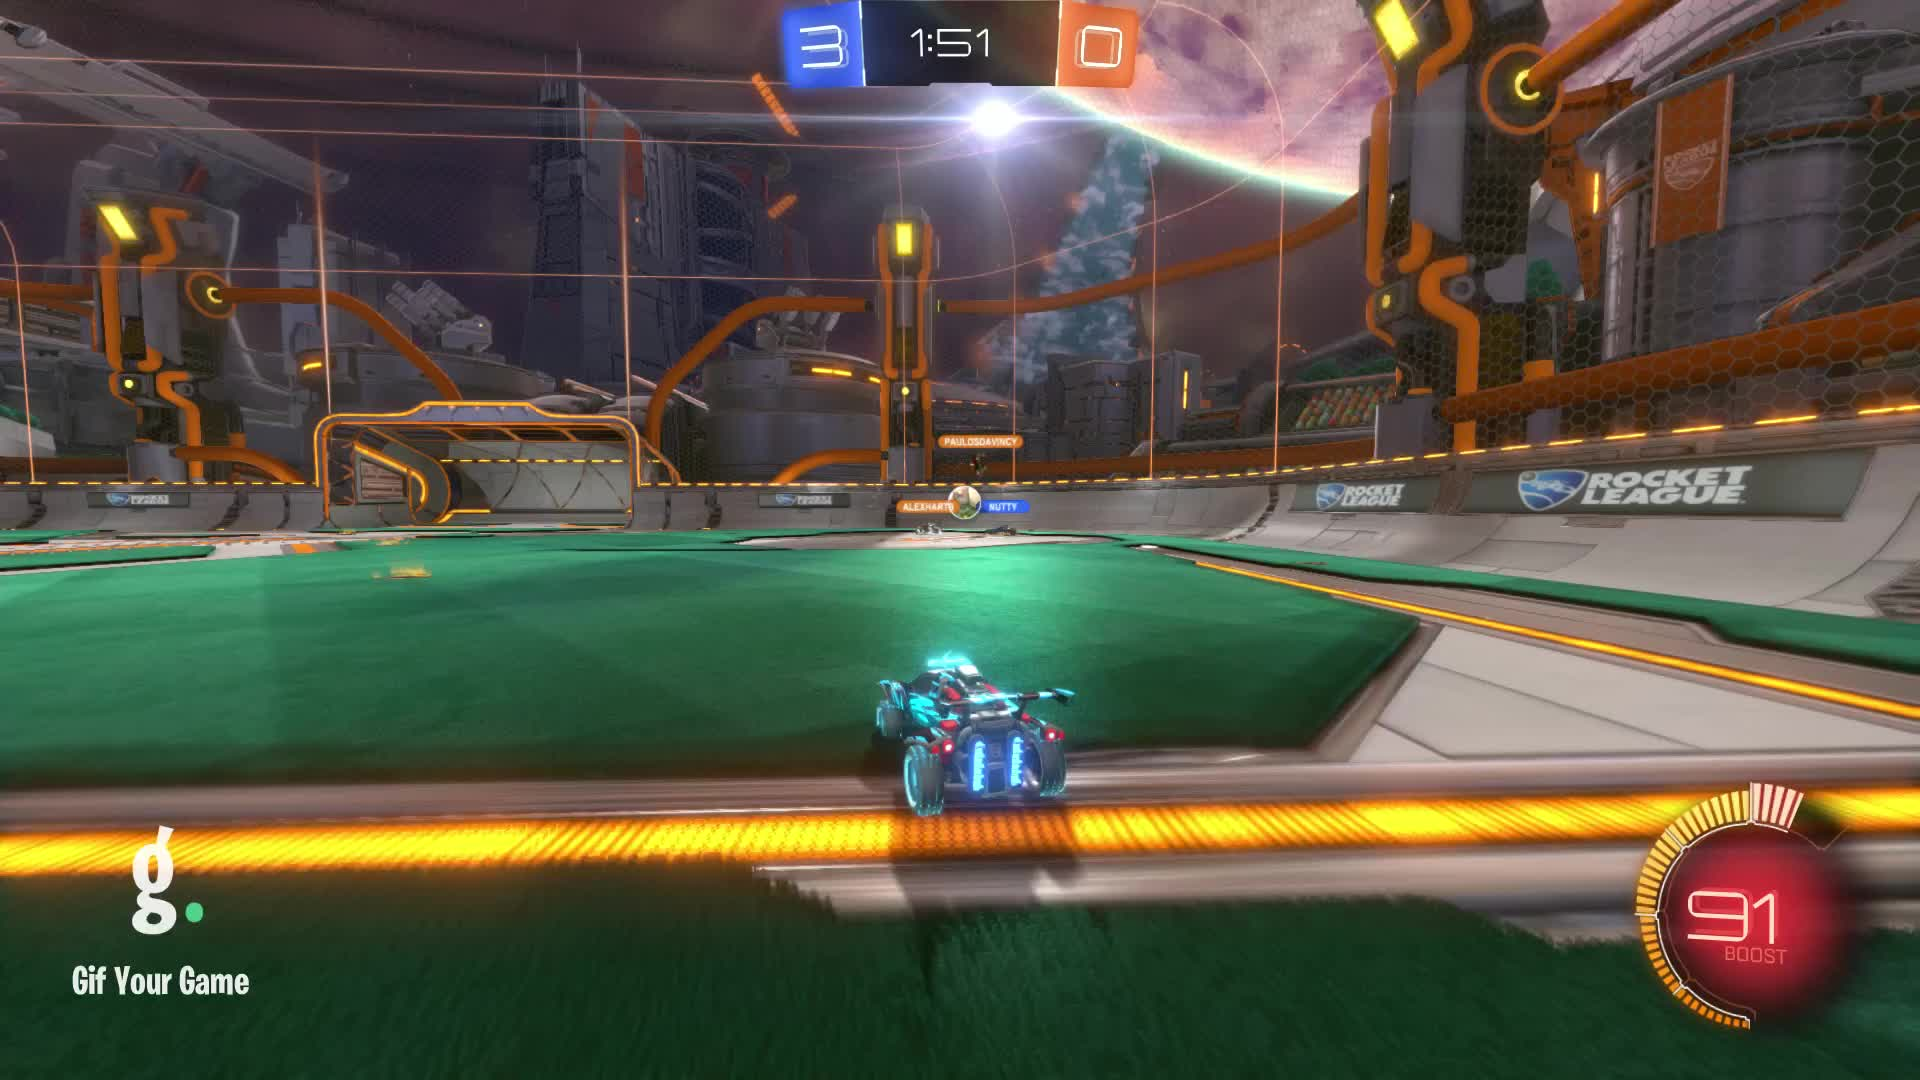 Gif Your Game, GifYourGame, Goal, OliBoi, Rocket League, RocketLeague, Goal 4: Nutty GIFs